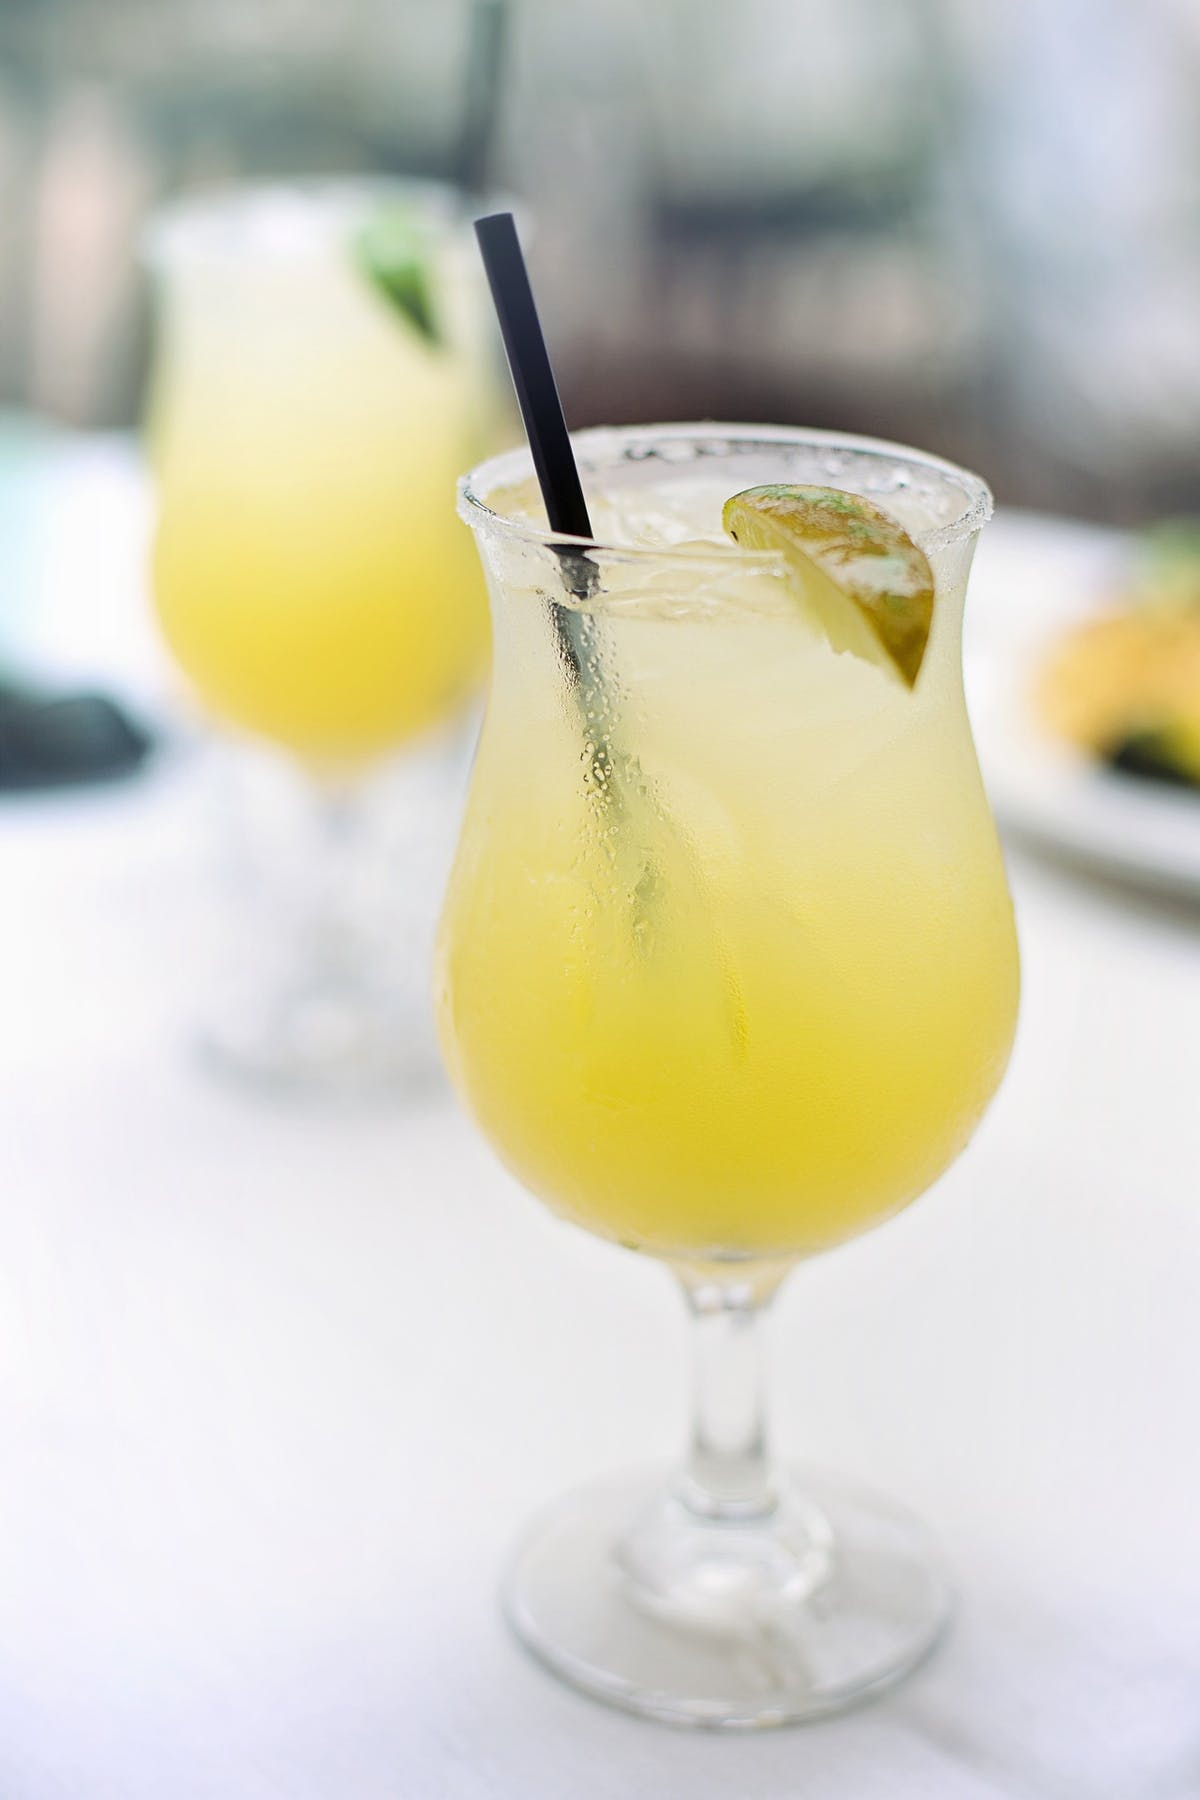 a glass of margarita